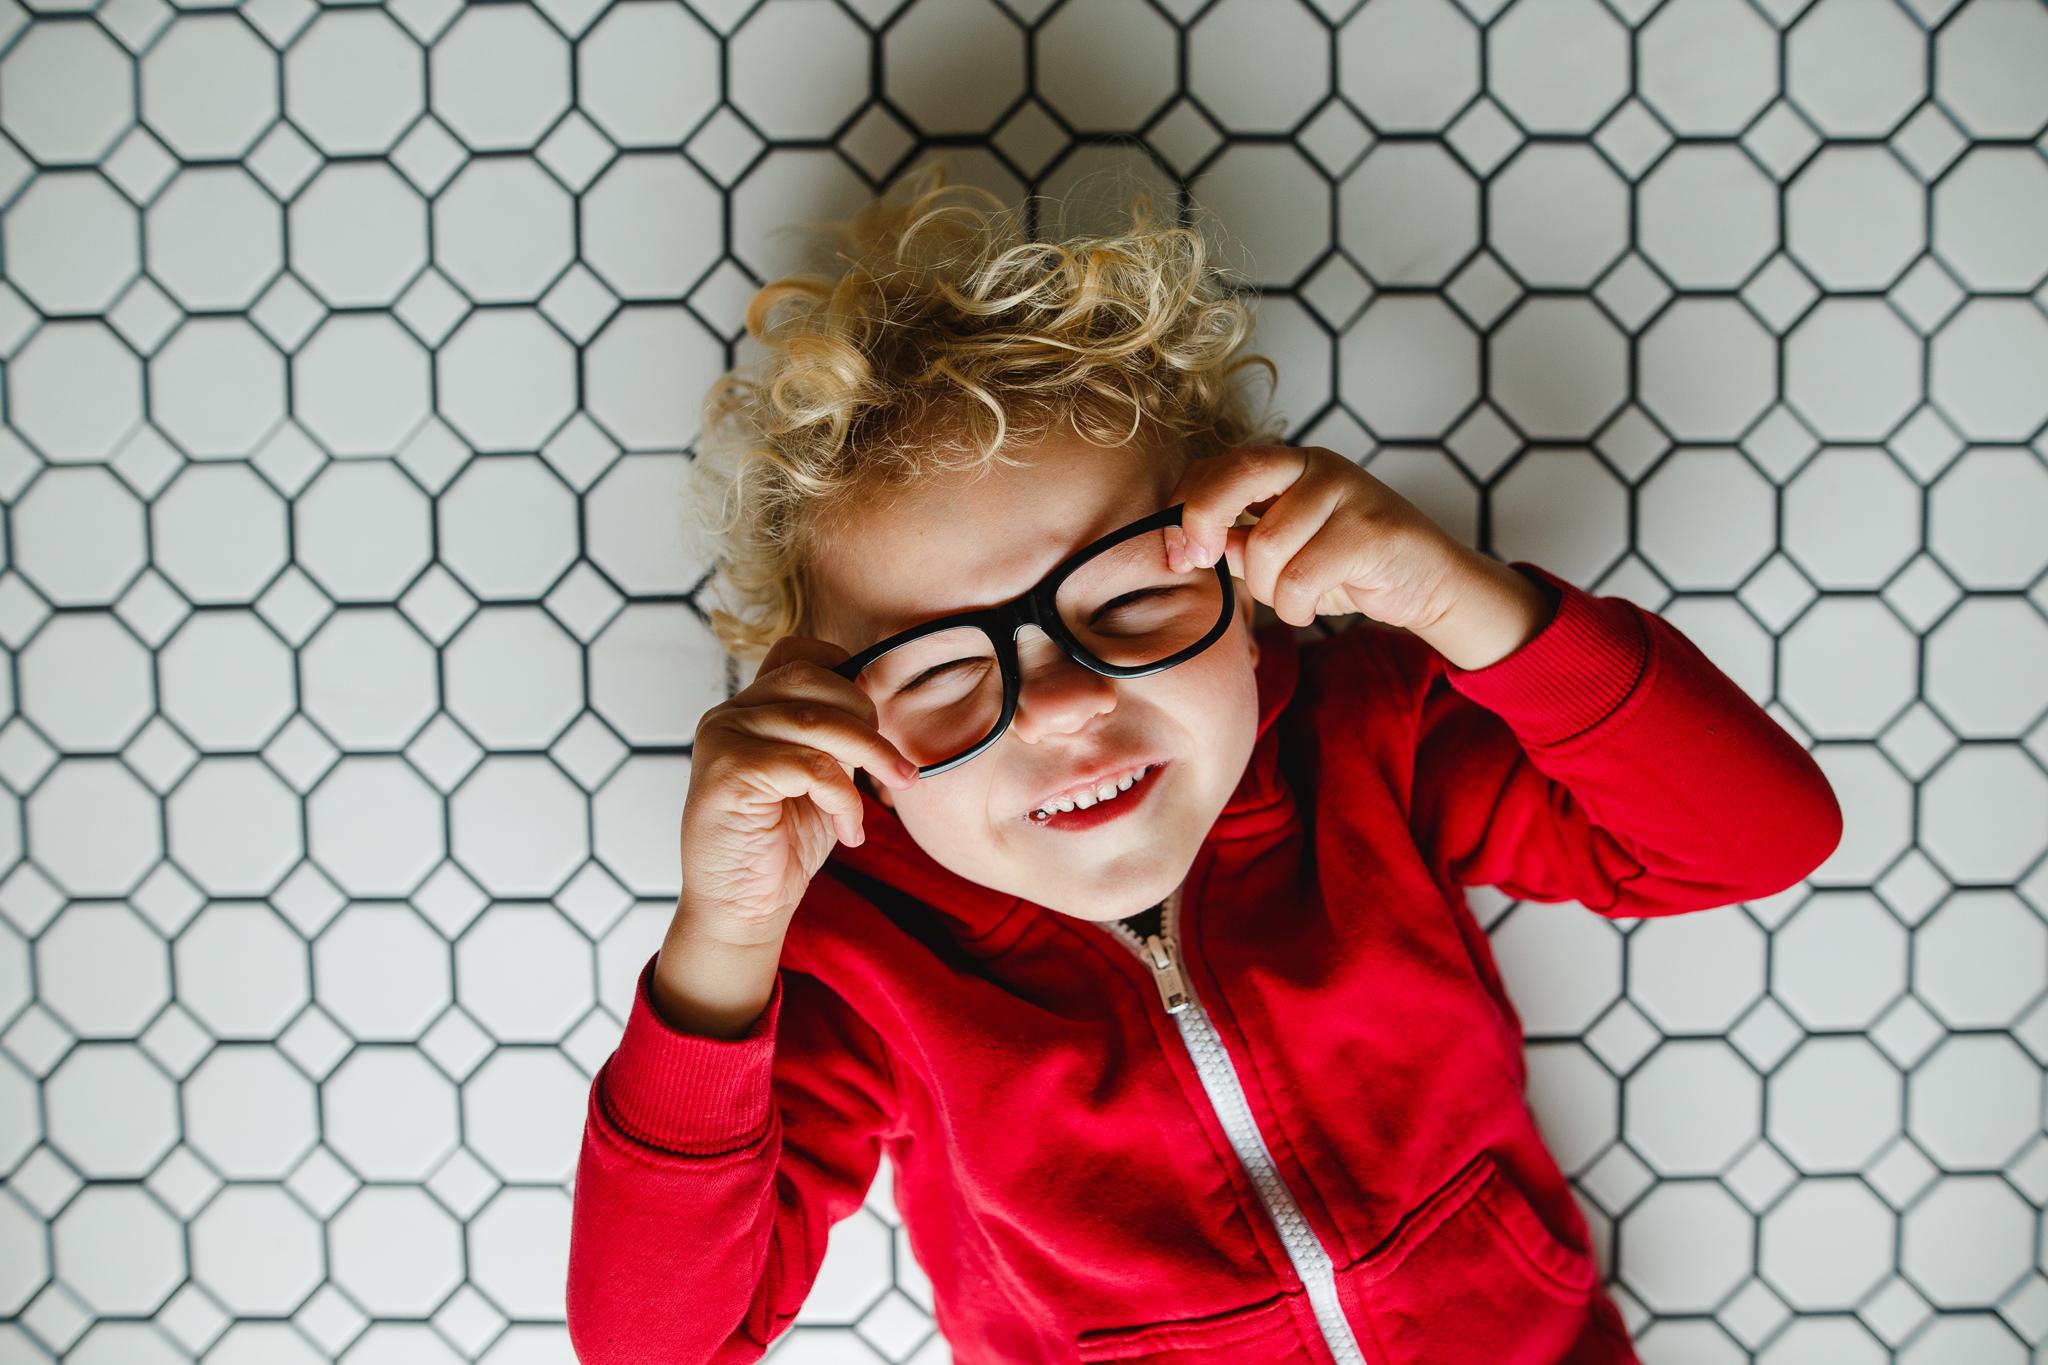 sullivan red sweatshirt tile glasses (1 of 1).jpg